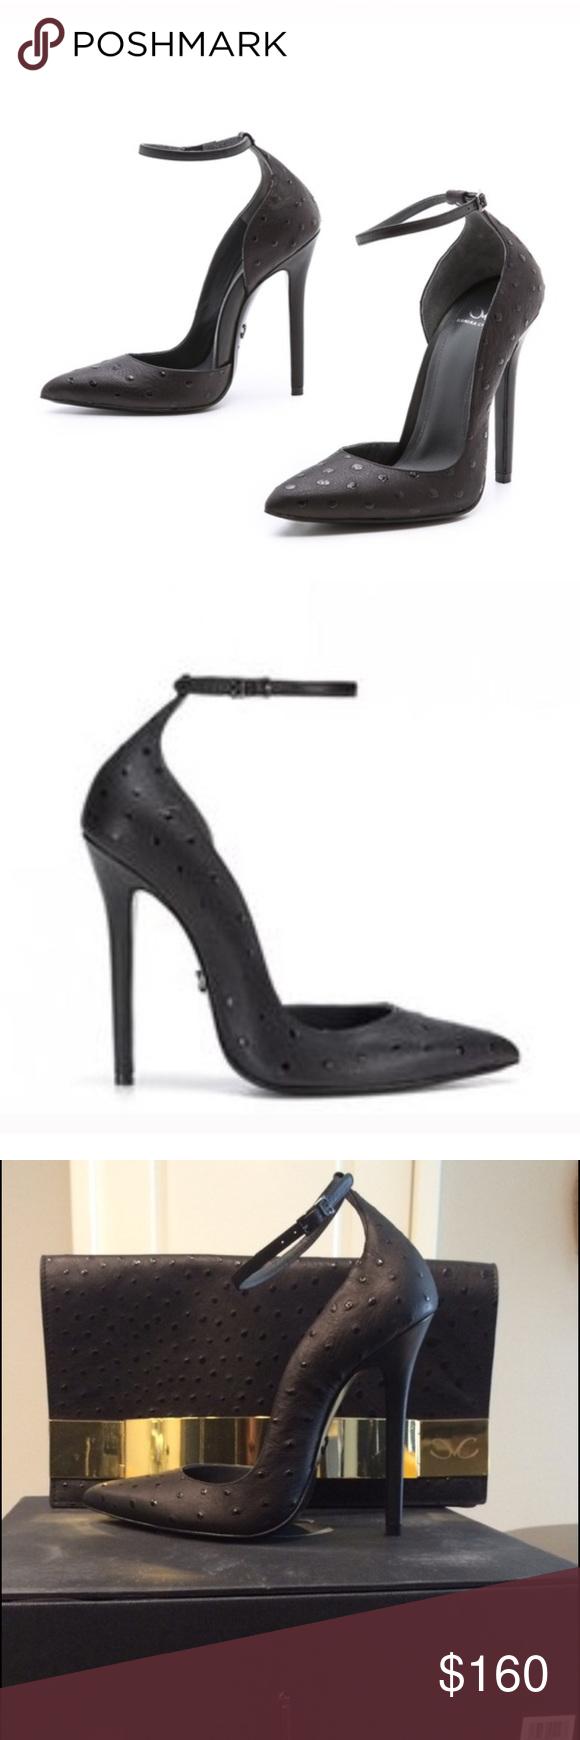 Selling this Monika Chiang d'orsey heels on Poshmark! My username is: heatherwhiting. #shopmycloset #poshmark #fashion #shopping #style #forsale #Monika Chiang #Shoes